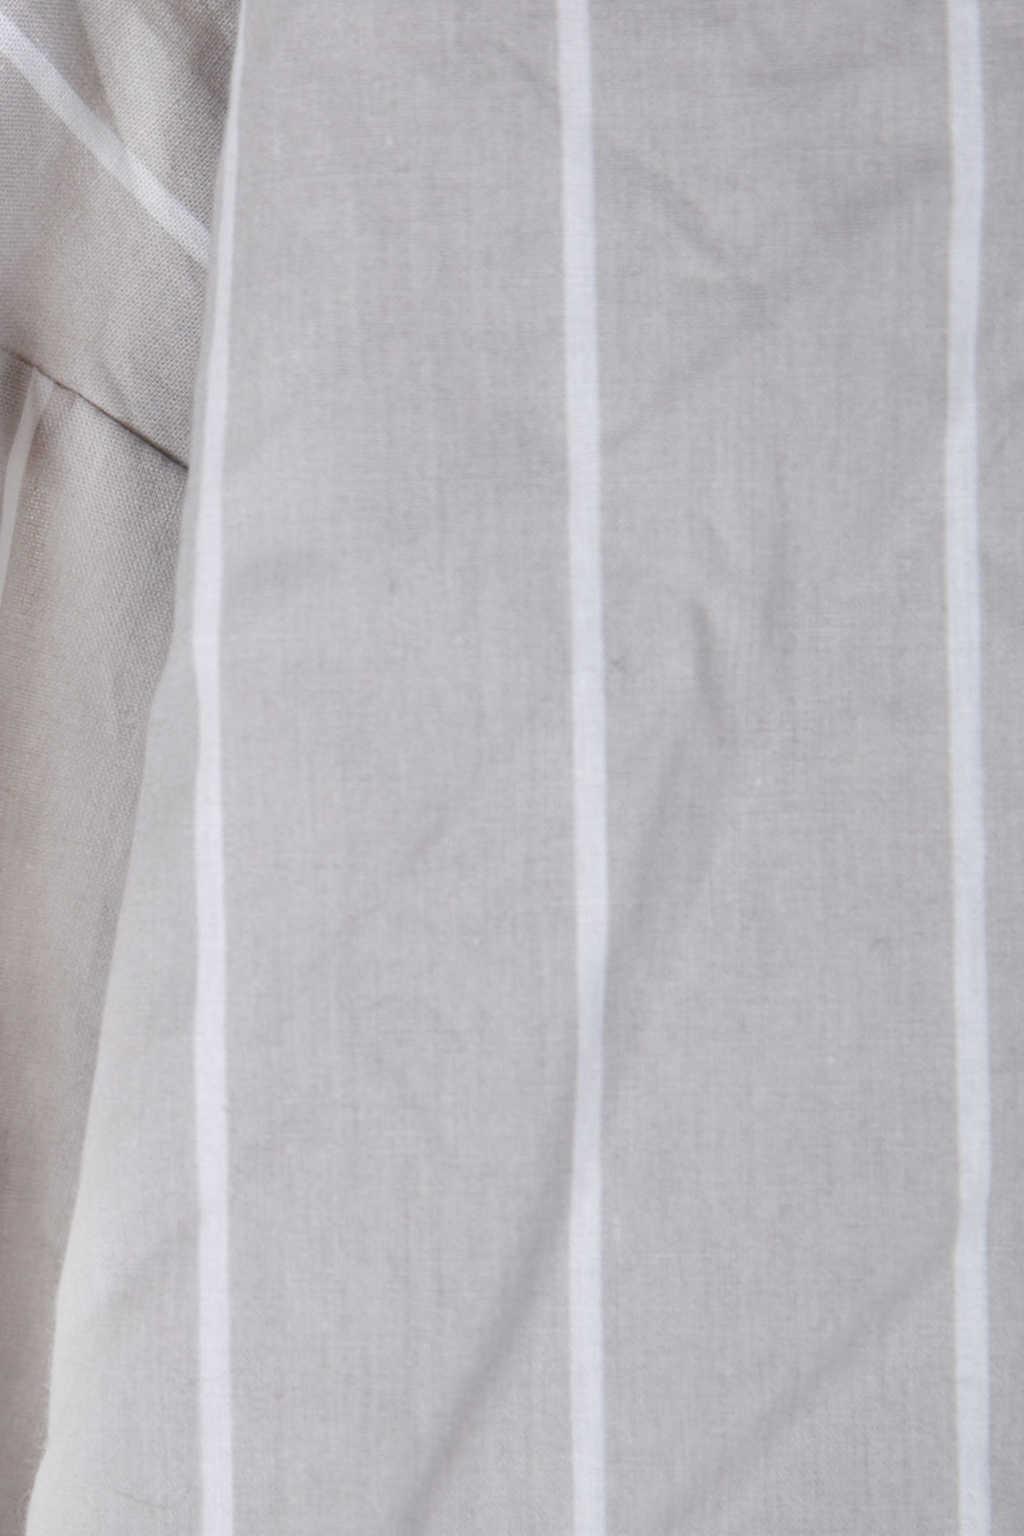 Blouse H393 Gray 10